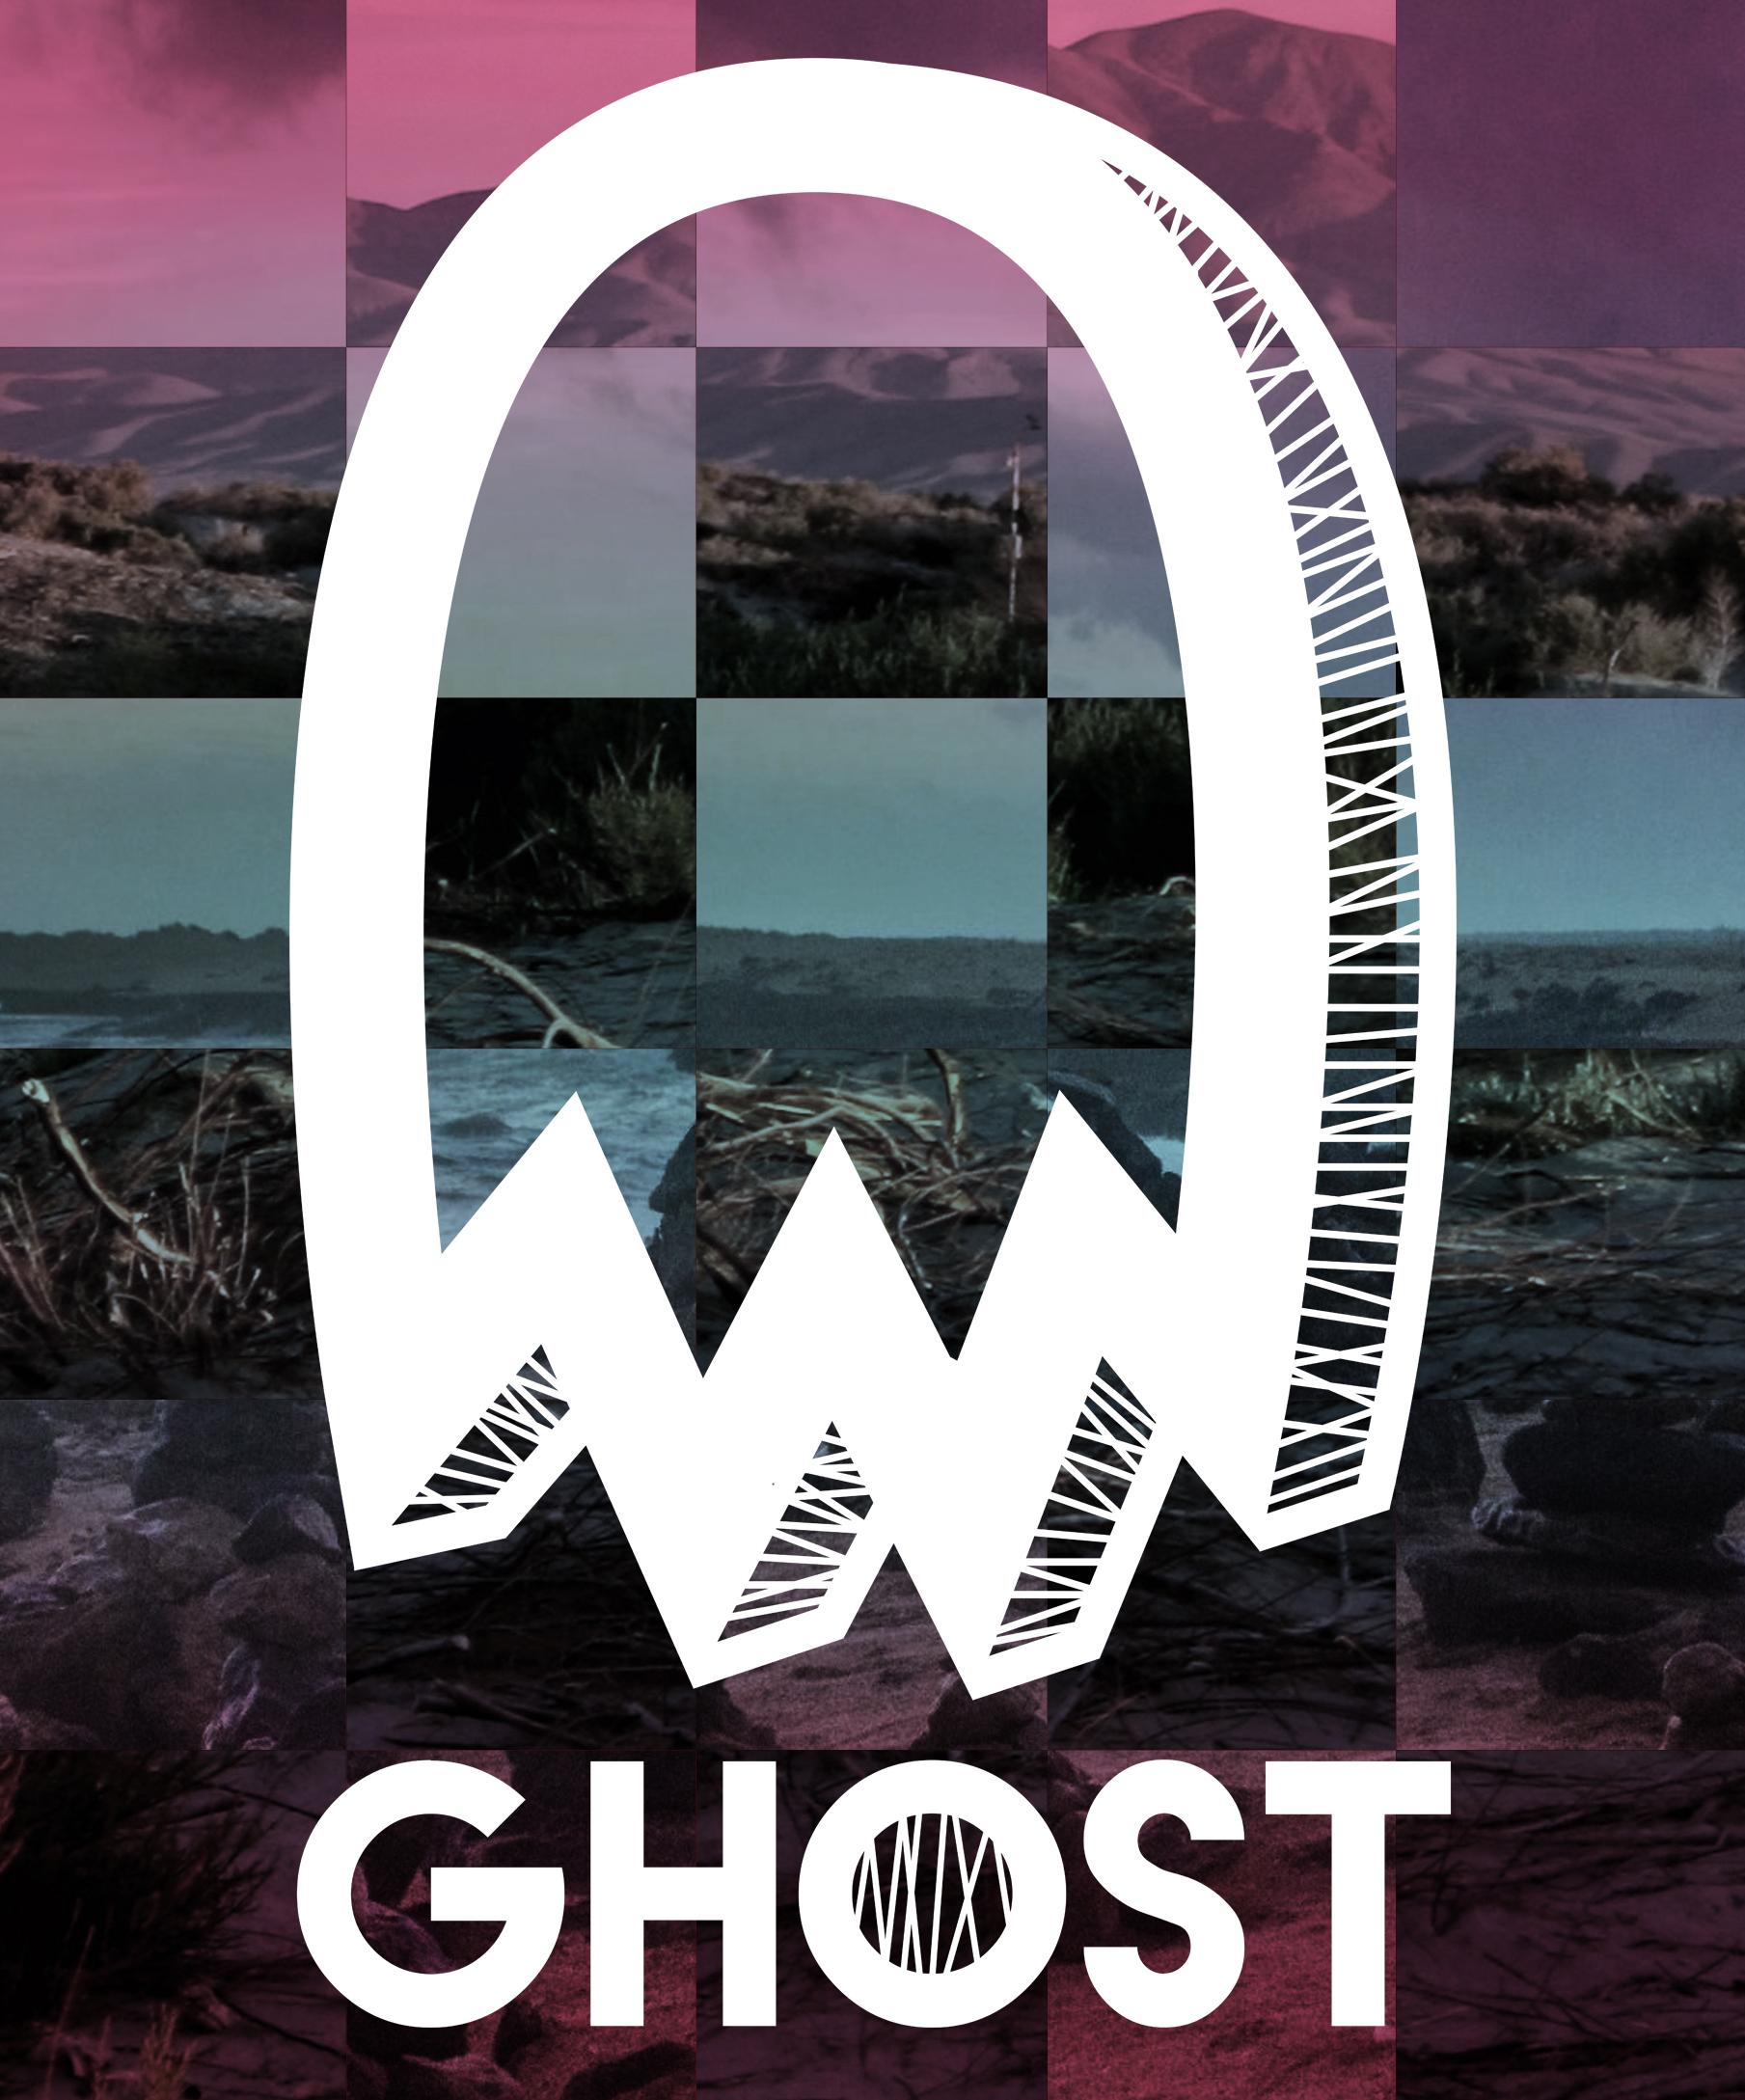 head_shot_ghost.jpg